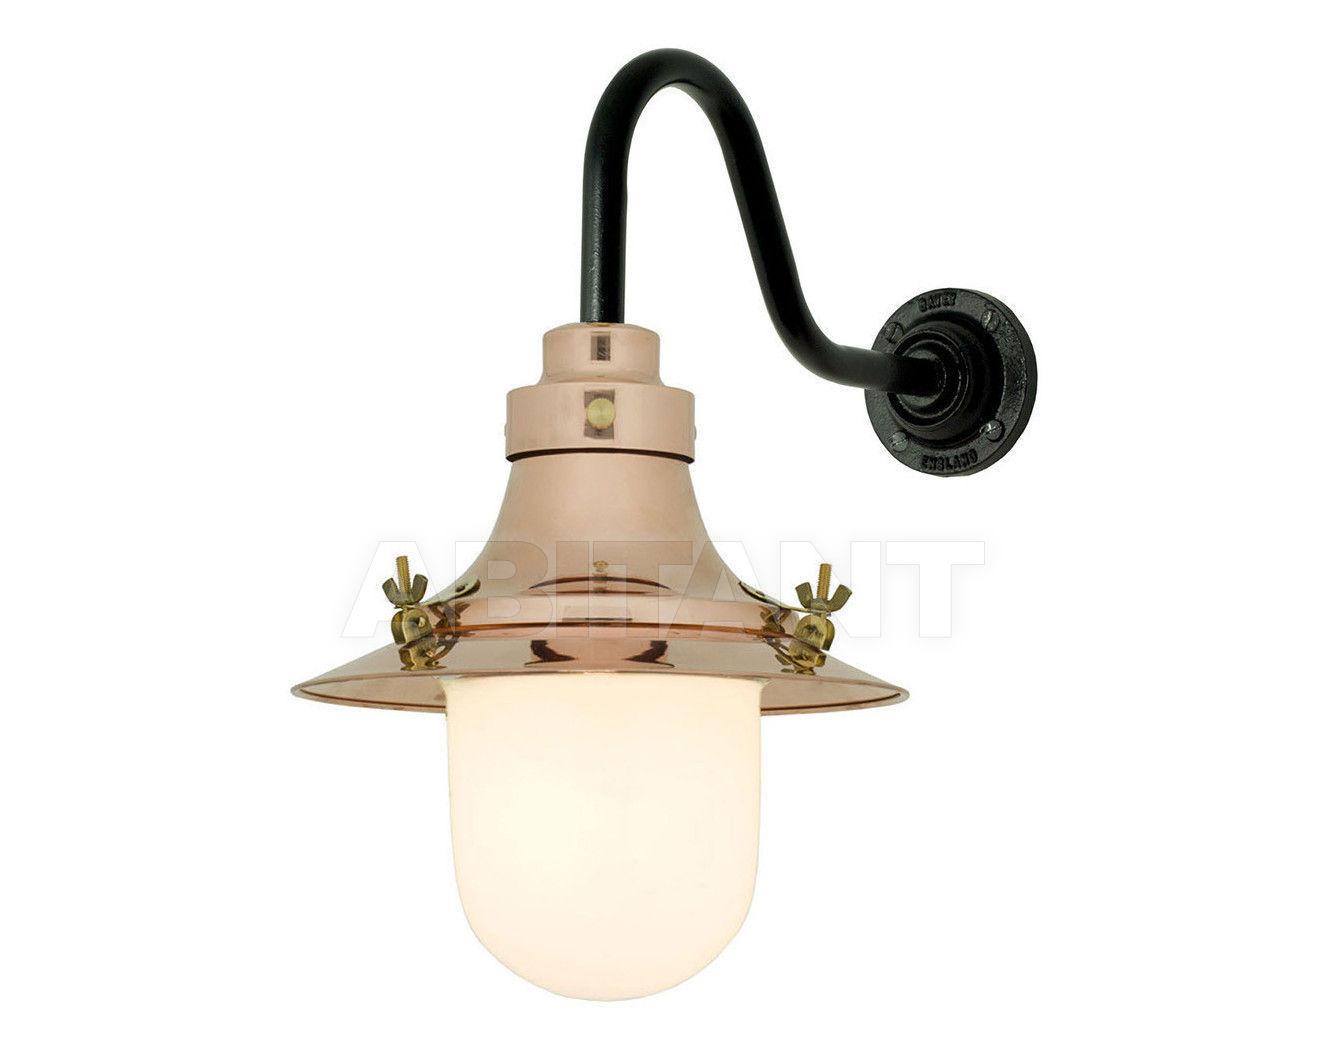 Купить Фонарь Davey Lighting Wall Mounted Lights 7125/CO/OP/SN